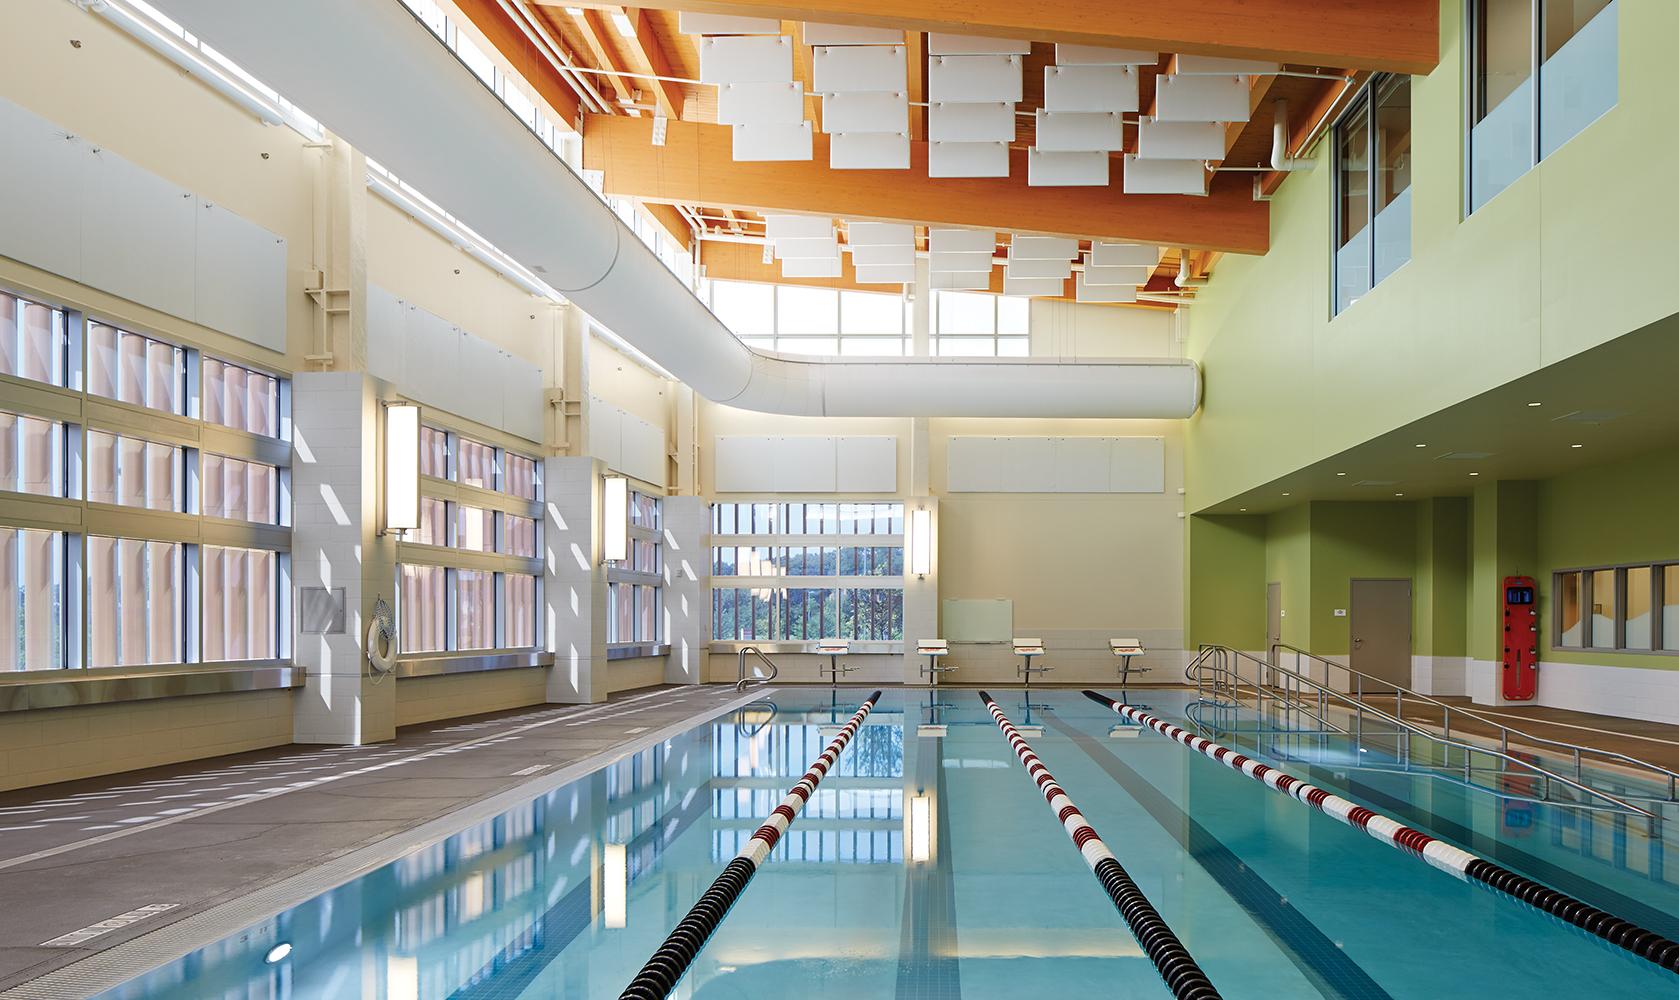 Air Foil sconces showing off modern lighting design along a well-lit indoor pool.